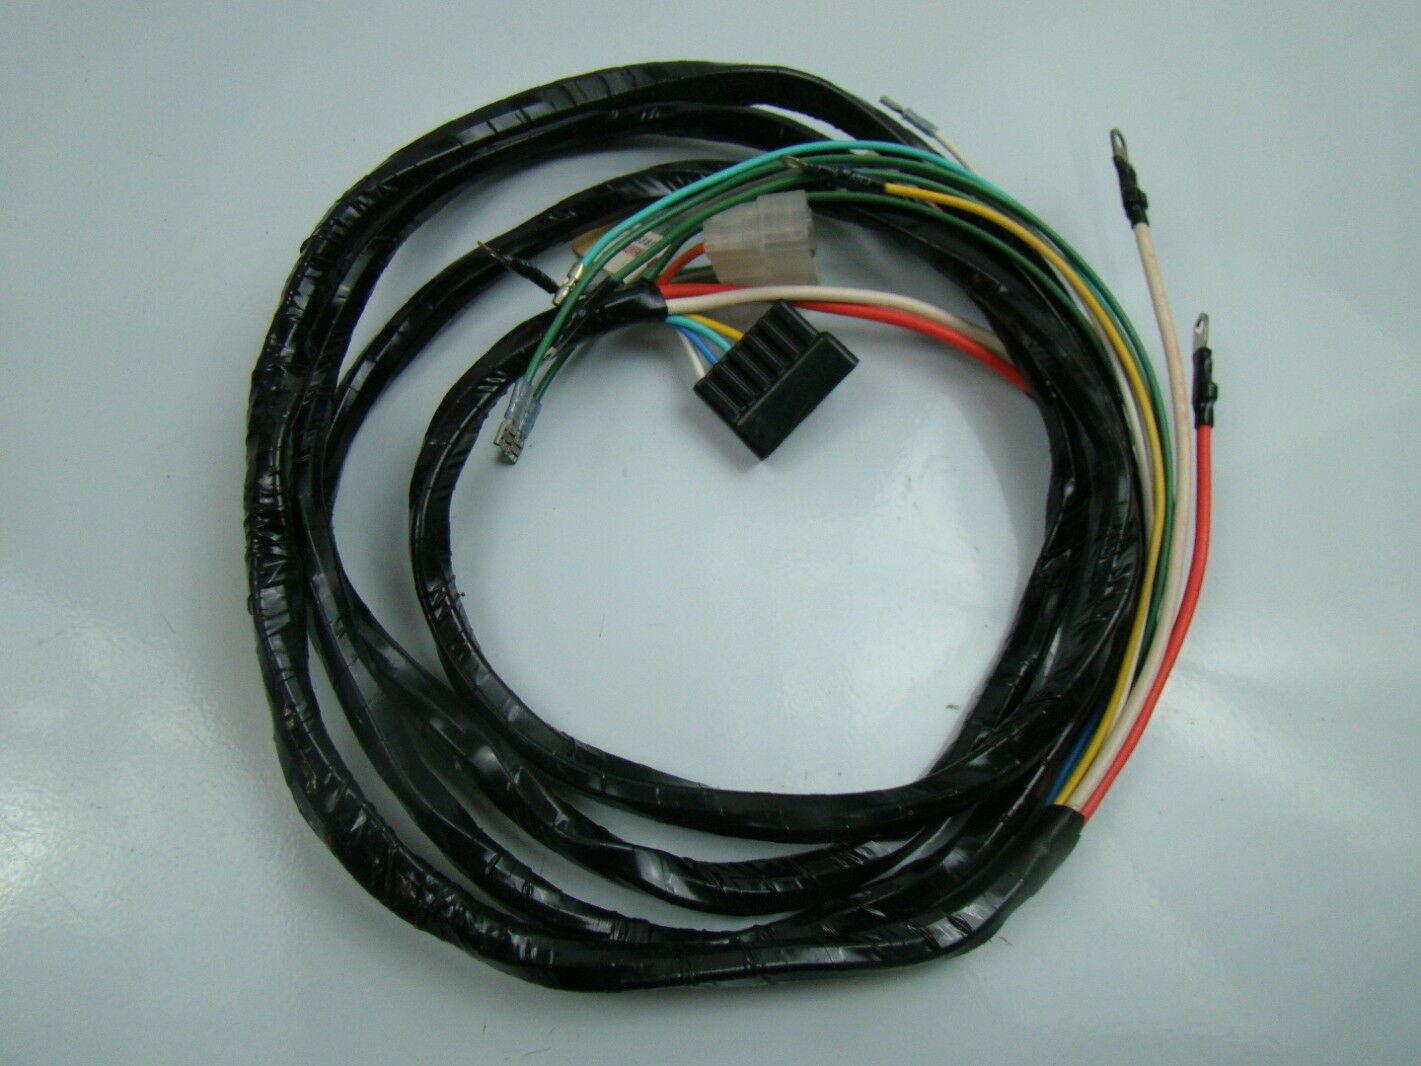 hight resolution of kauffman engineering wiring harness 536359